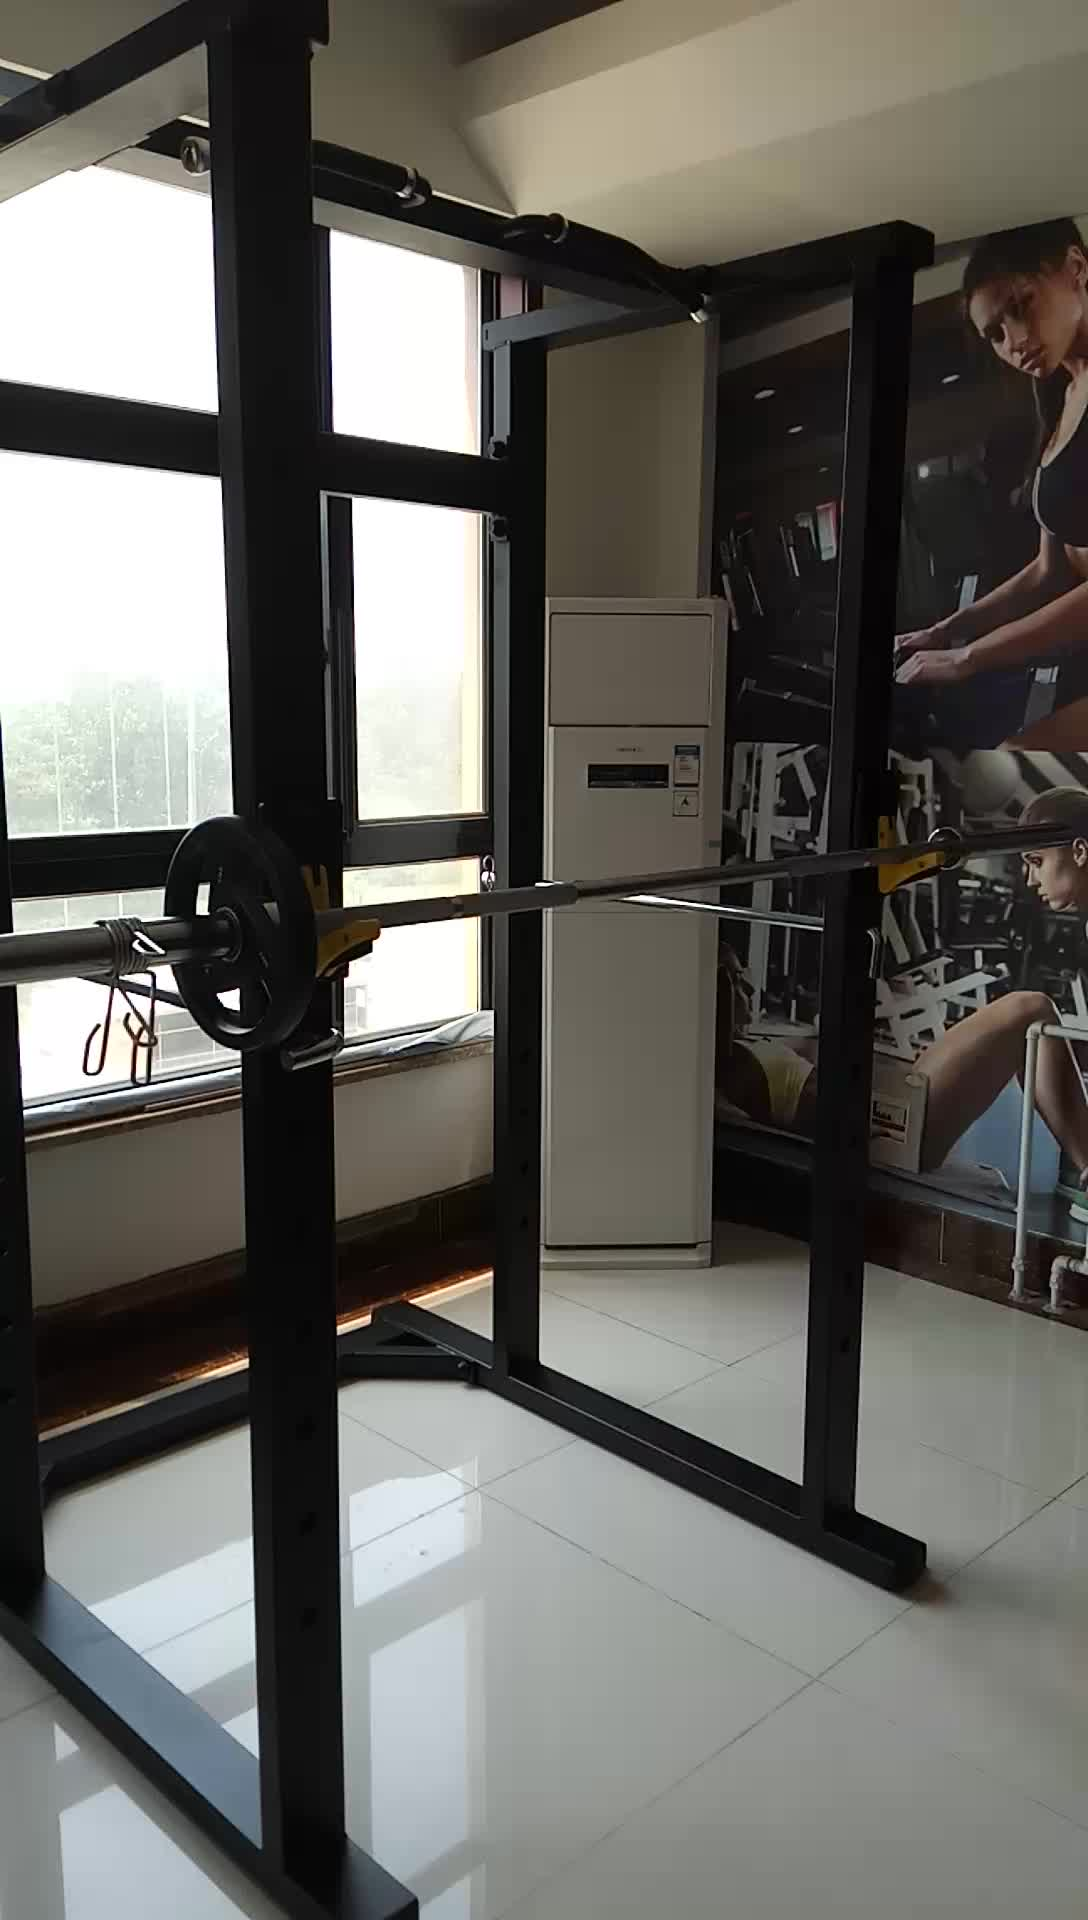 multi gym equipment precor power rack buy power rack fitness power rack multi gym equipment. Black Bedroom Furniture Sets. Home Design Ideas